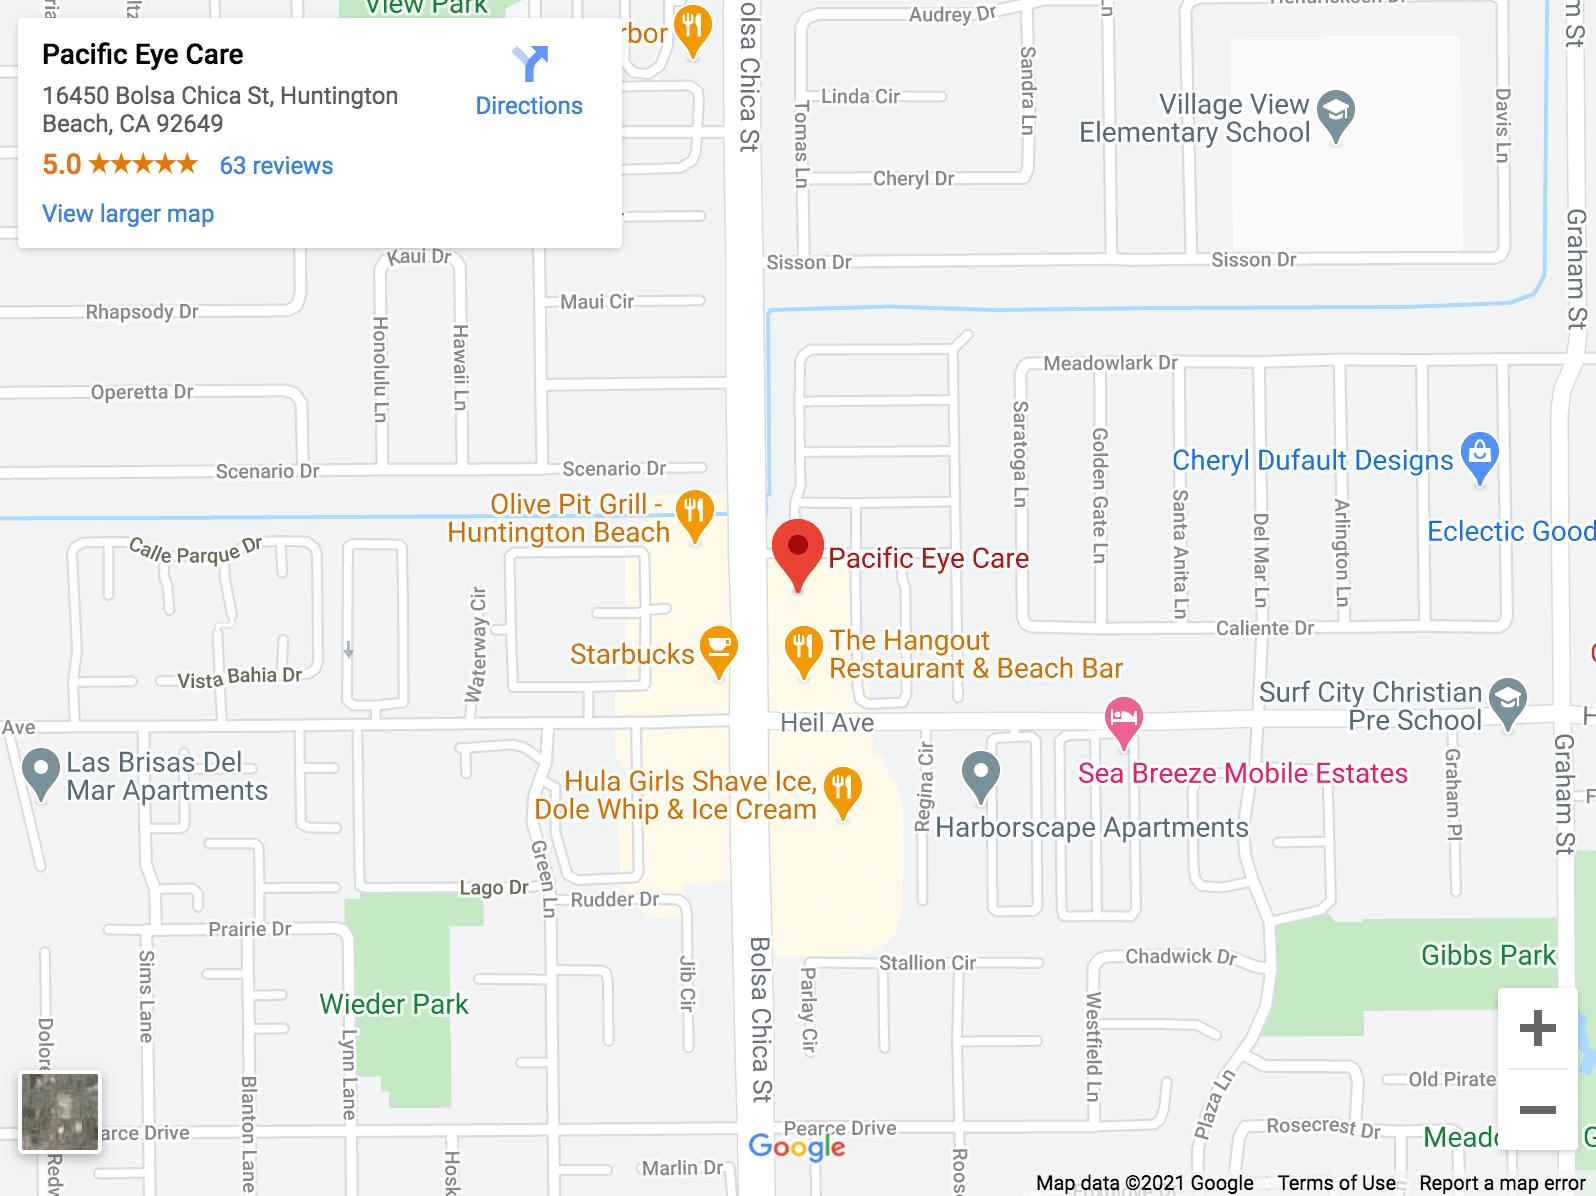 Your eye care clinic in Huntington Beach - Pacific Eye Care